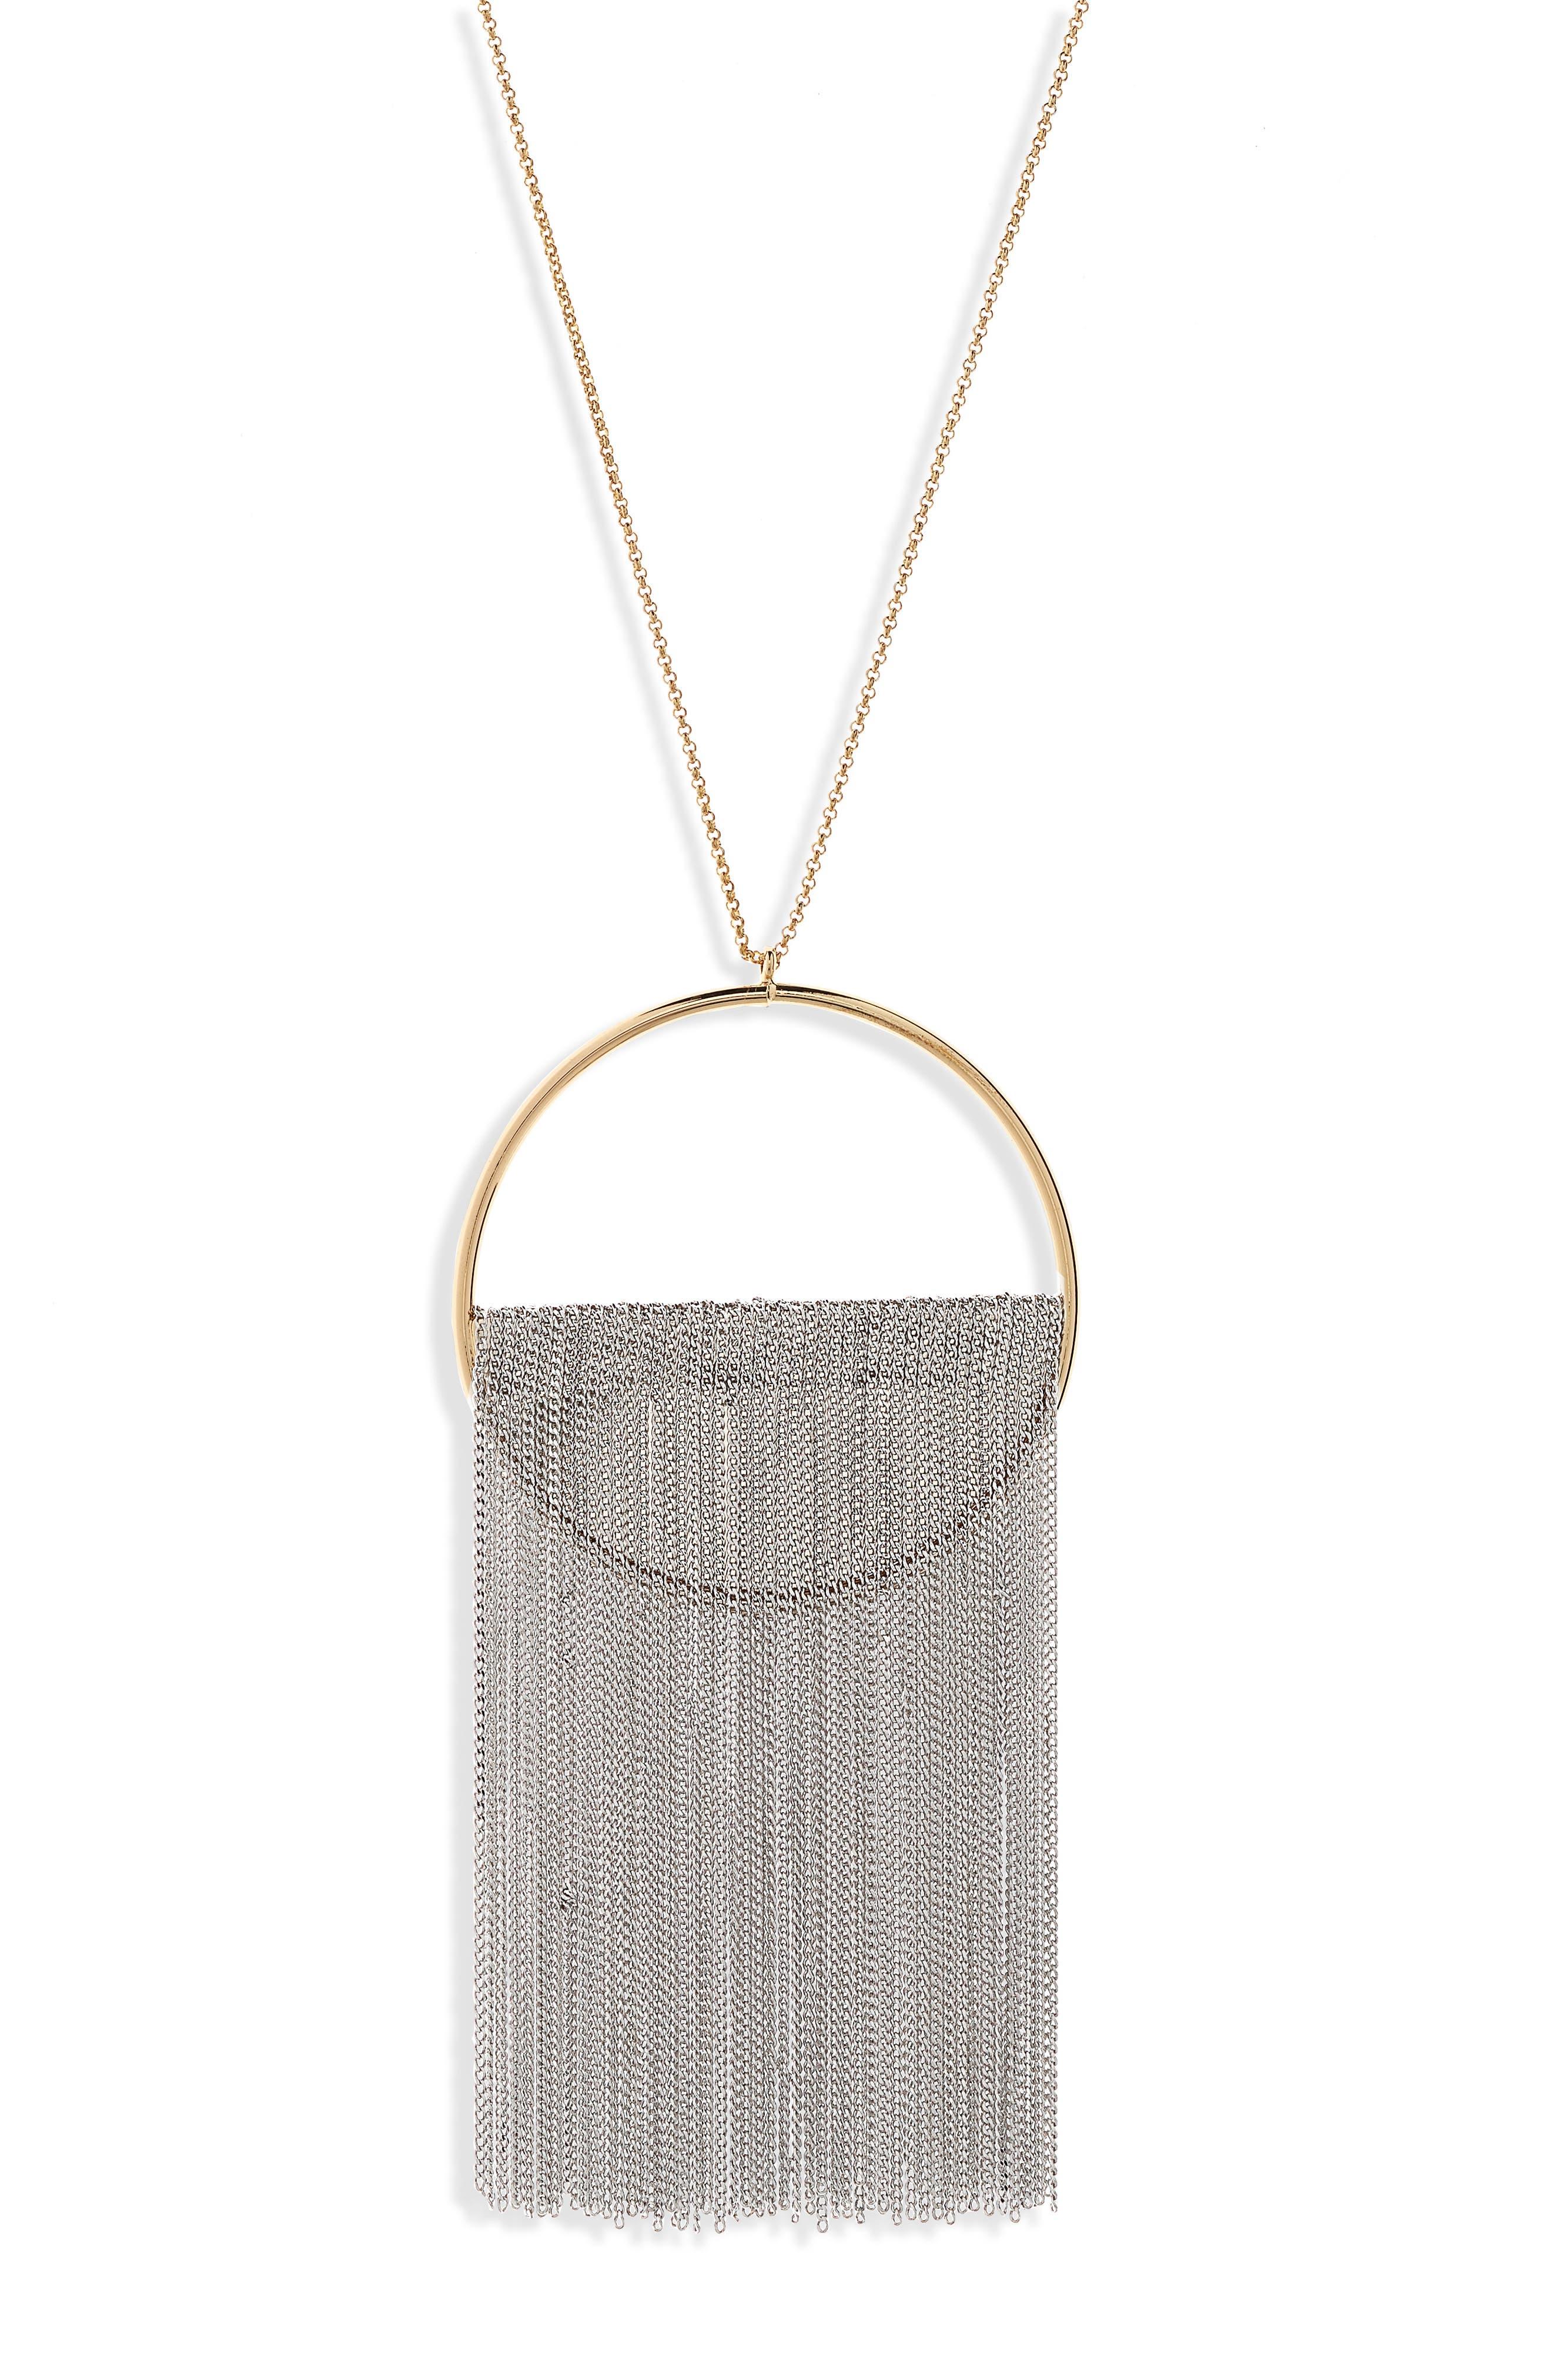 Fringe Pendant Necklace,                             Alternate thumbnail 2, color,                             Gold